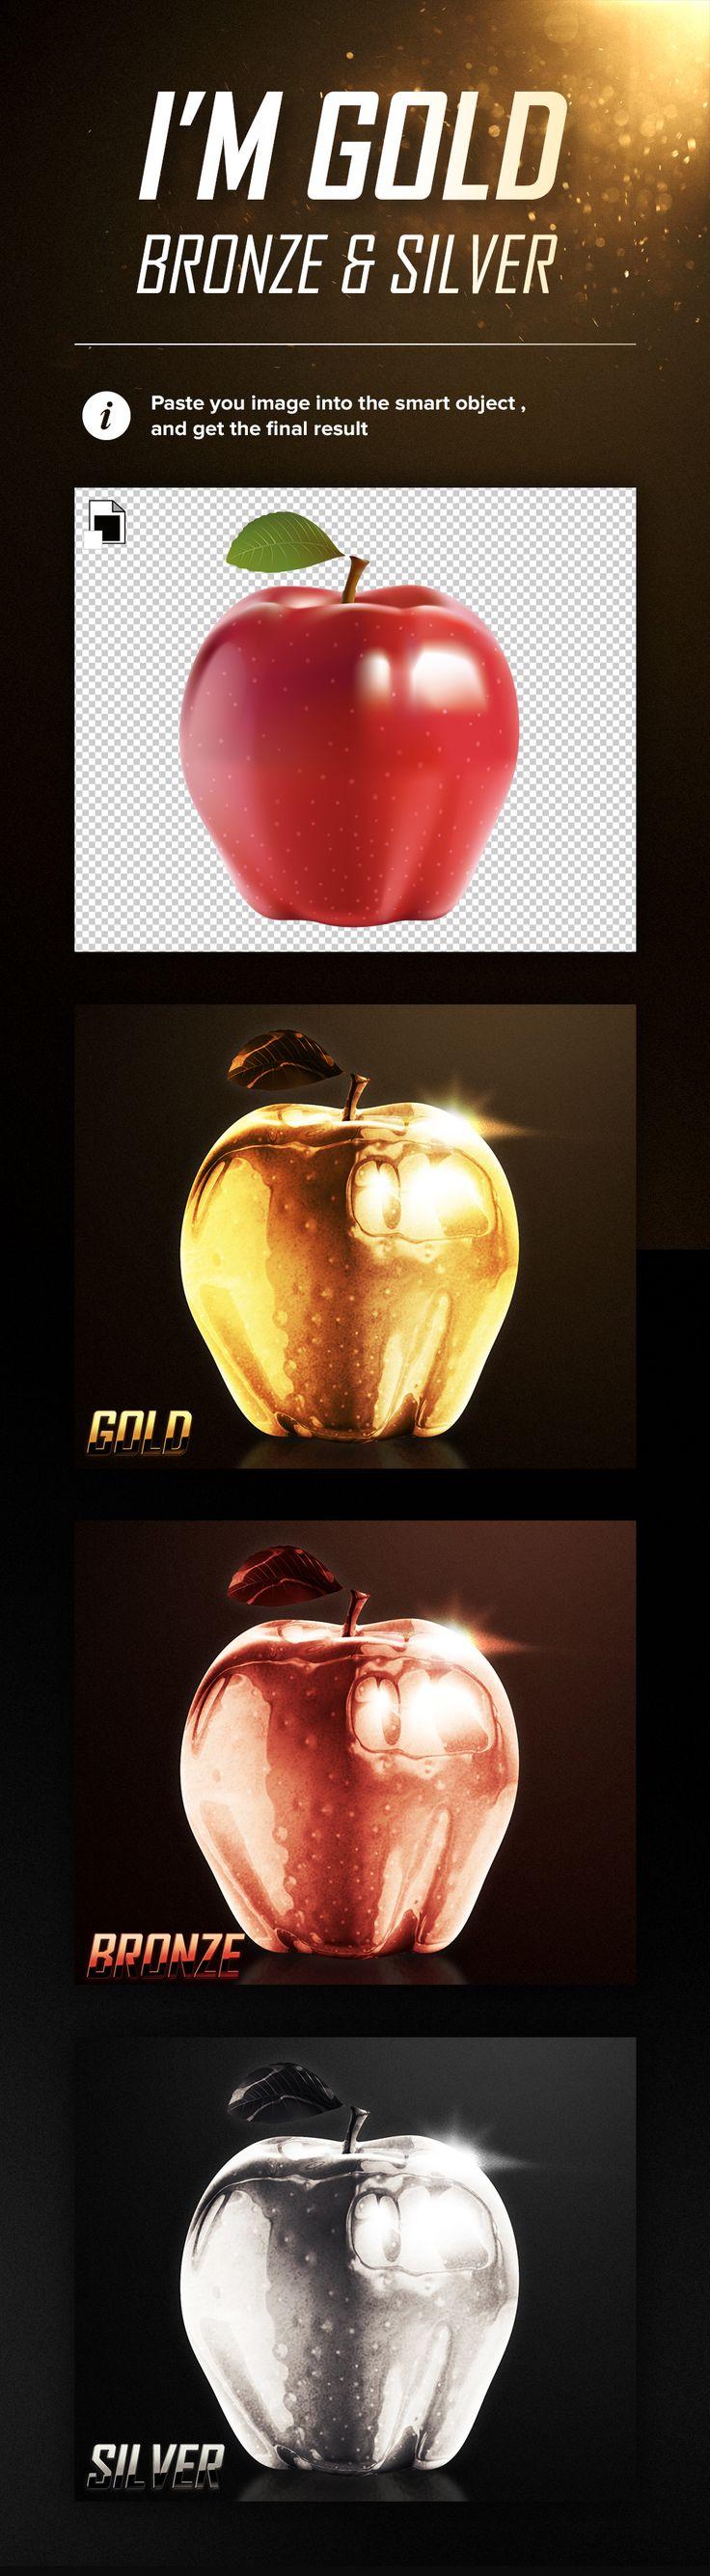 Free I'm Gold, Bronze & Silver Mockup (98 MB) | pixelmustache.net